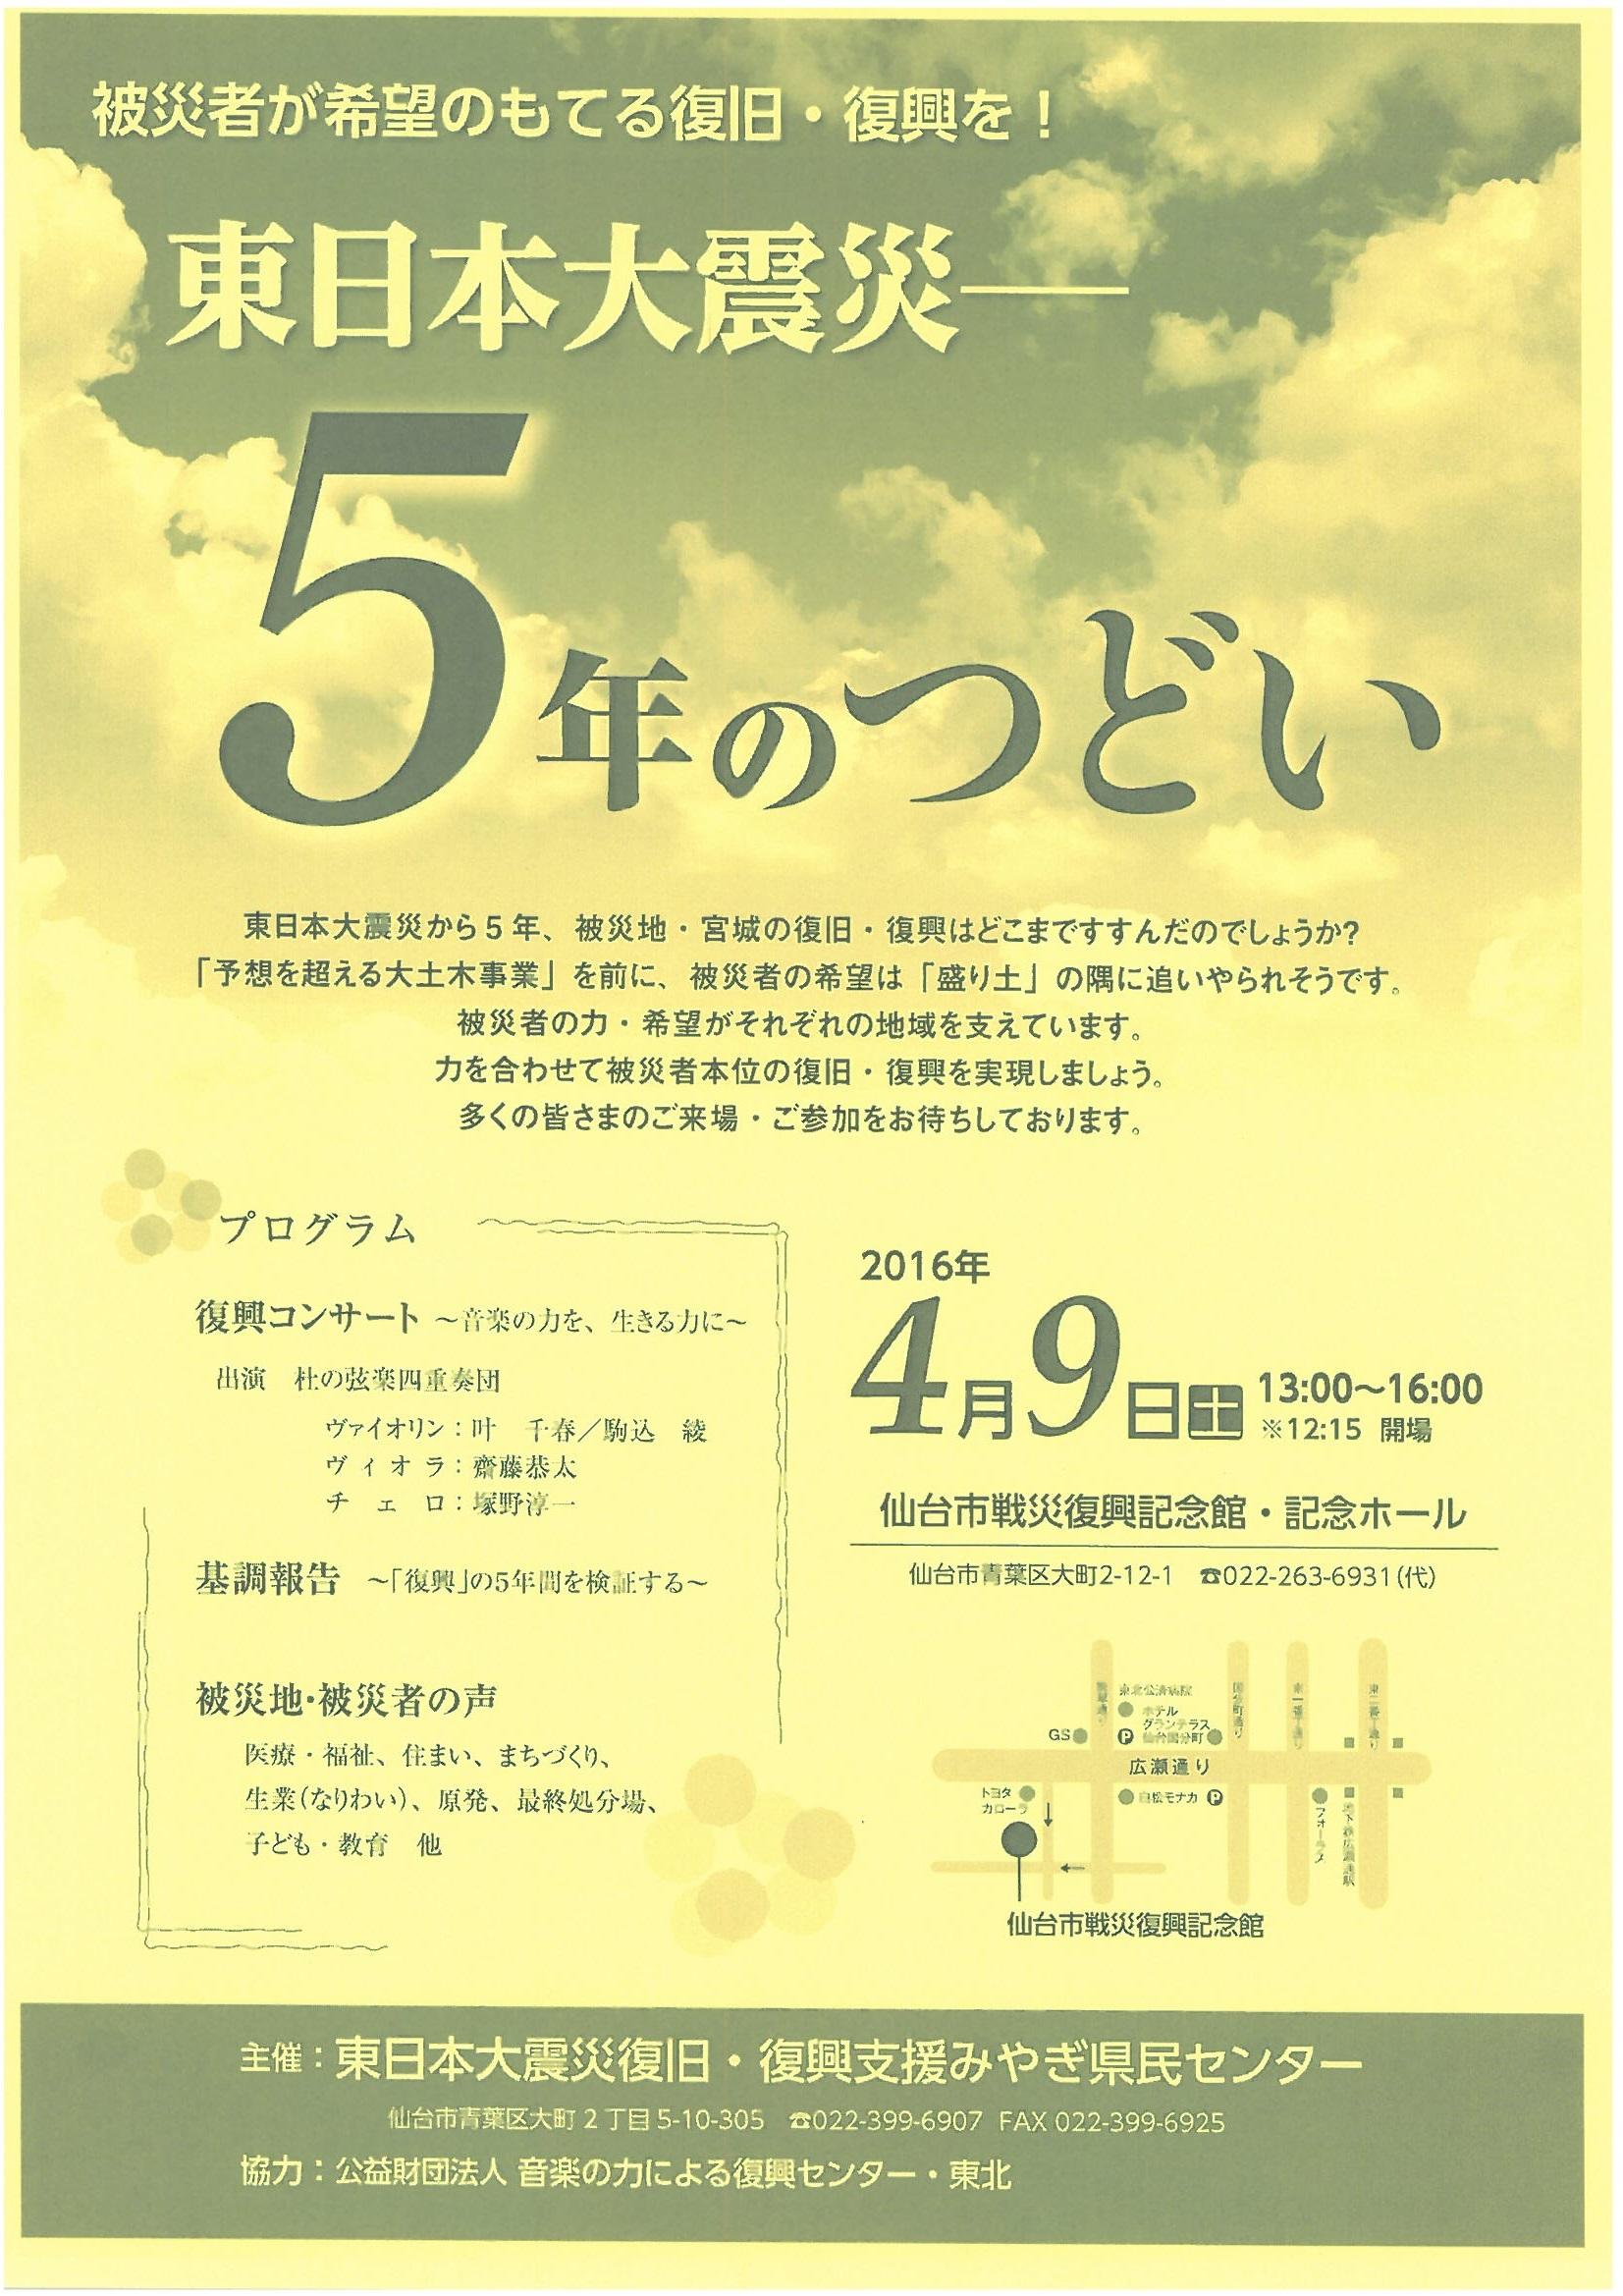 SKMBT_C22016031812390_0002.jpg